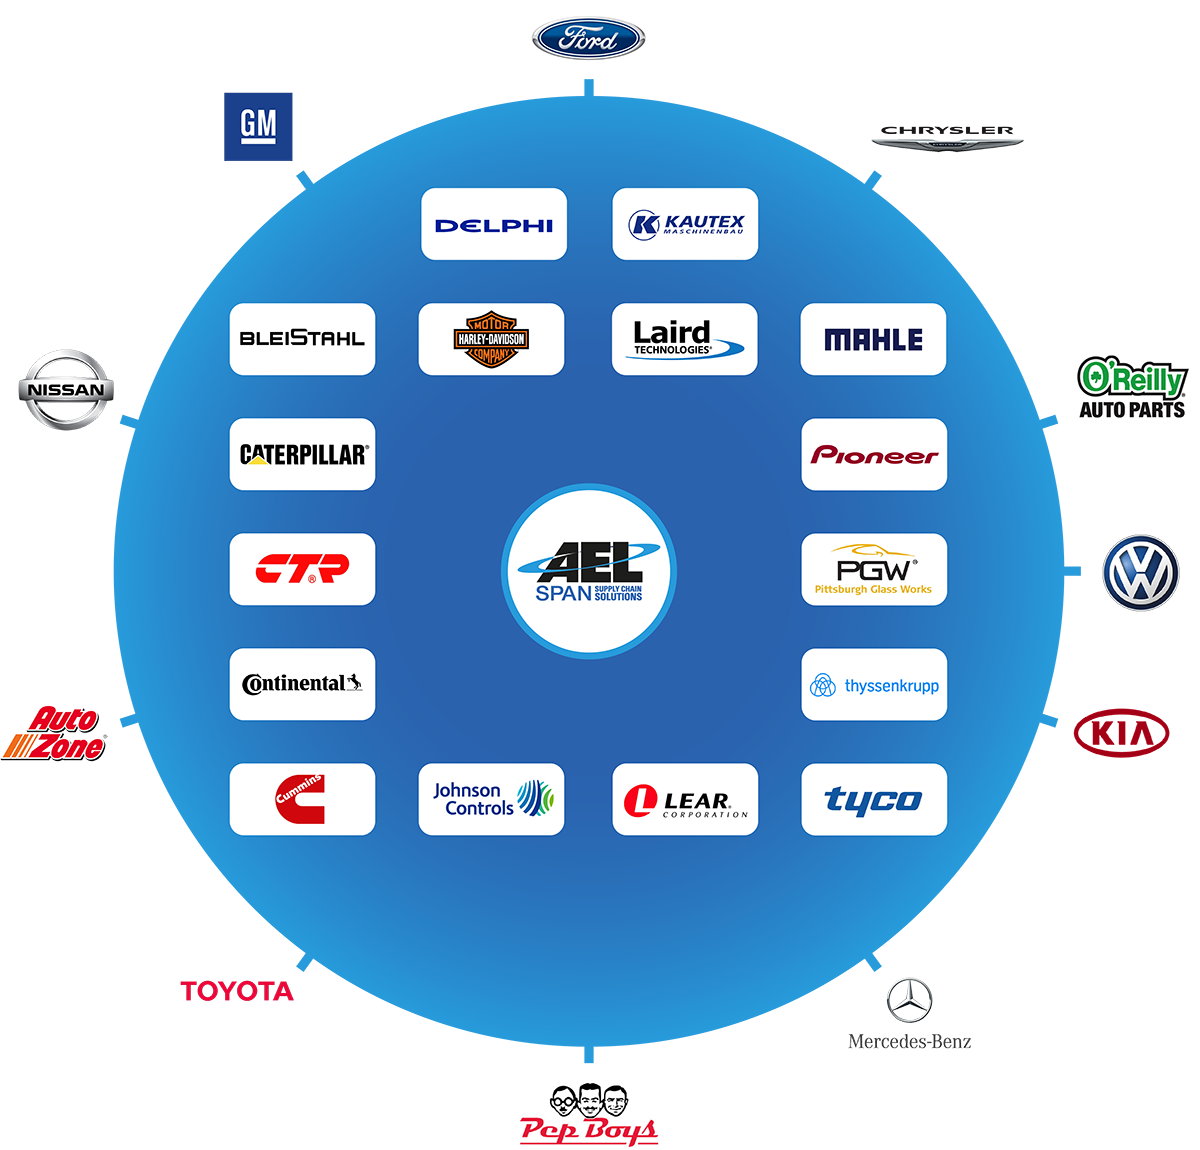 AEL Span Customers Caterpillar Nissan GM Ford Chrysler O'Reilly VW Kia Mercedes-Benz Pep Boys Toyota Auto Zone